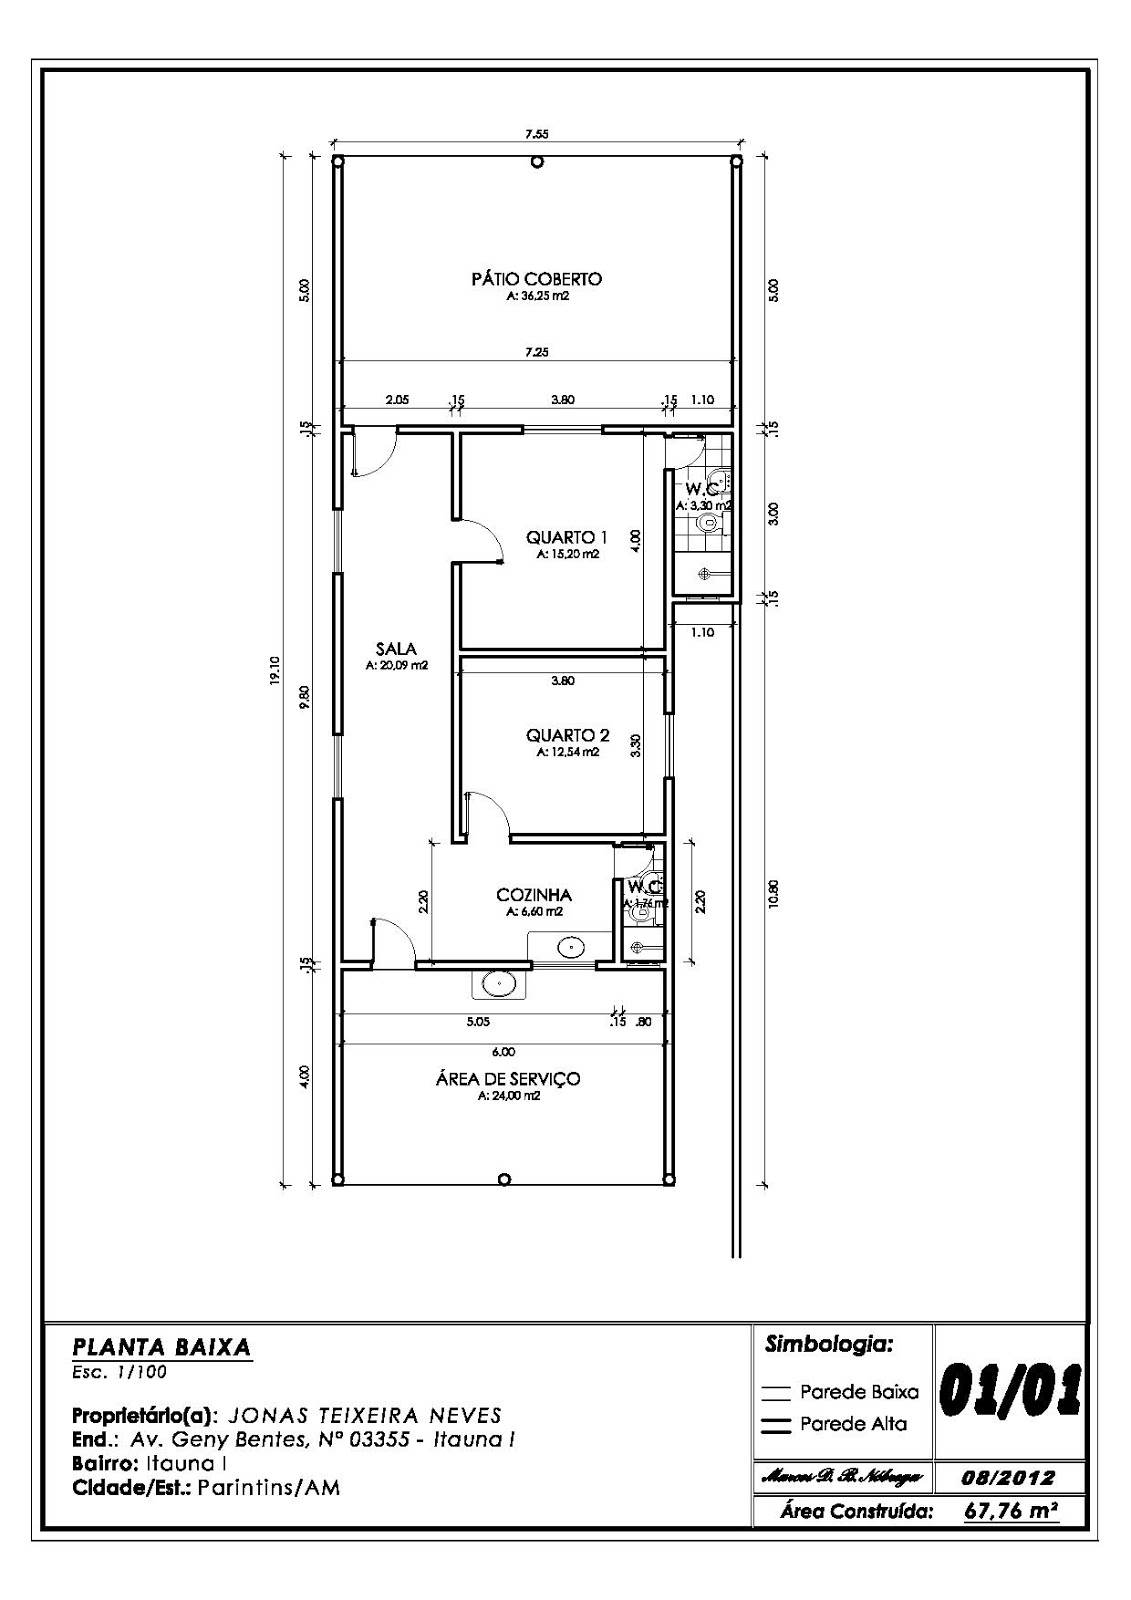 Layout Projetado: Planta Baixa de residencia localizada na